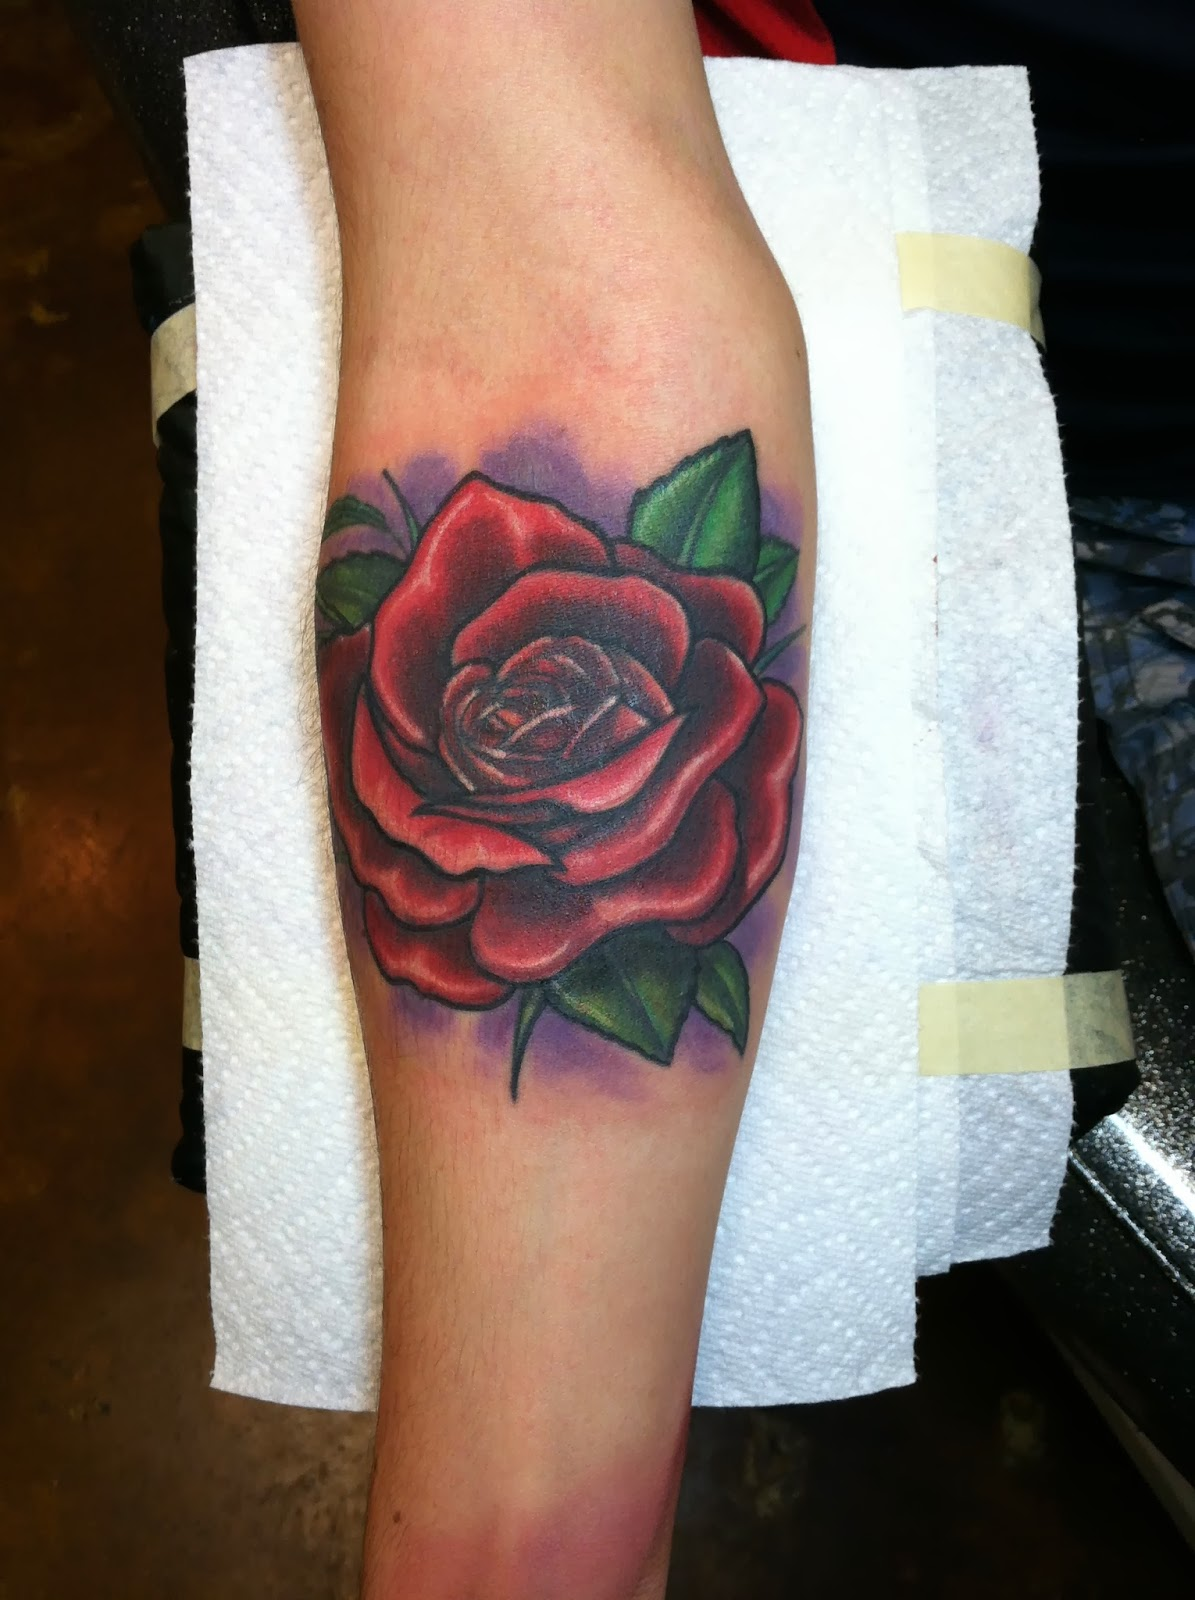 401582b787ab8 ... David Meek Tattoos at Fast Lane Tattoo in Tucson. Illustrative Custom  Color Rose Forearm Tattoo